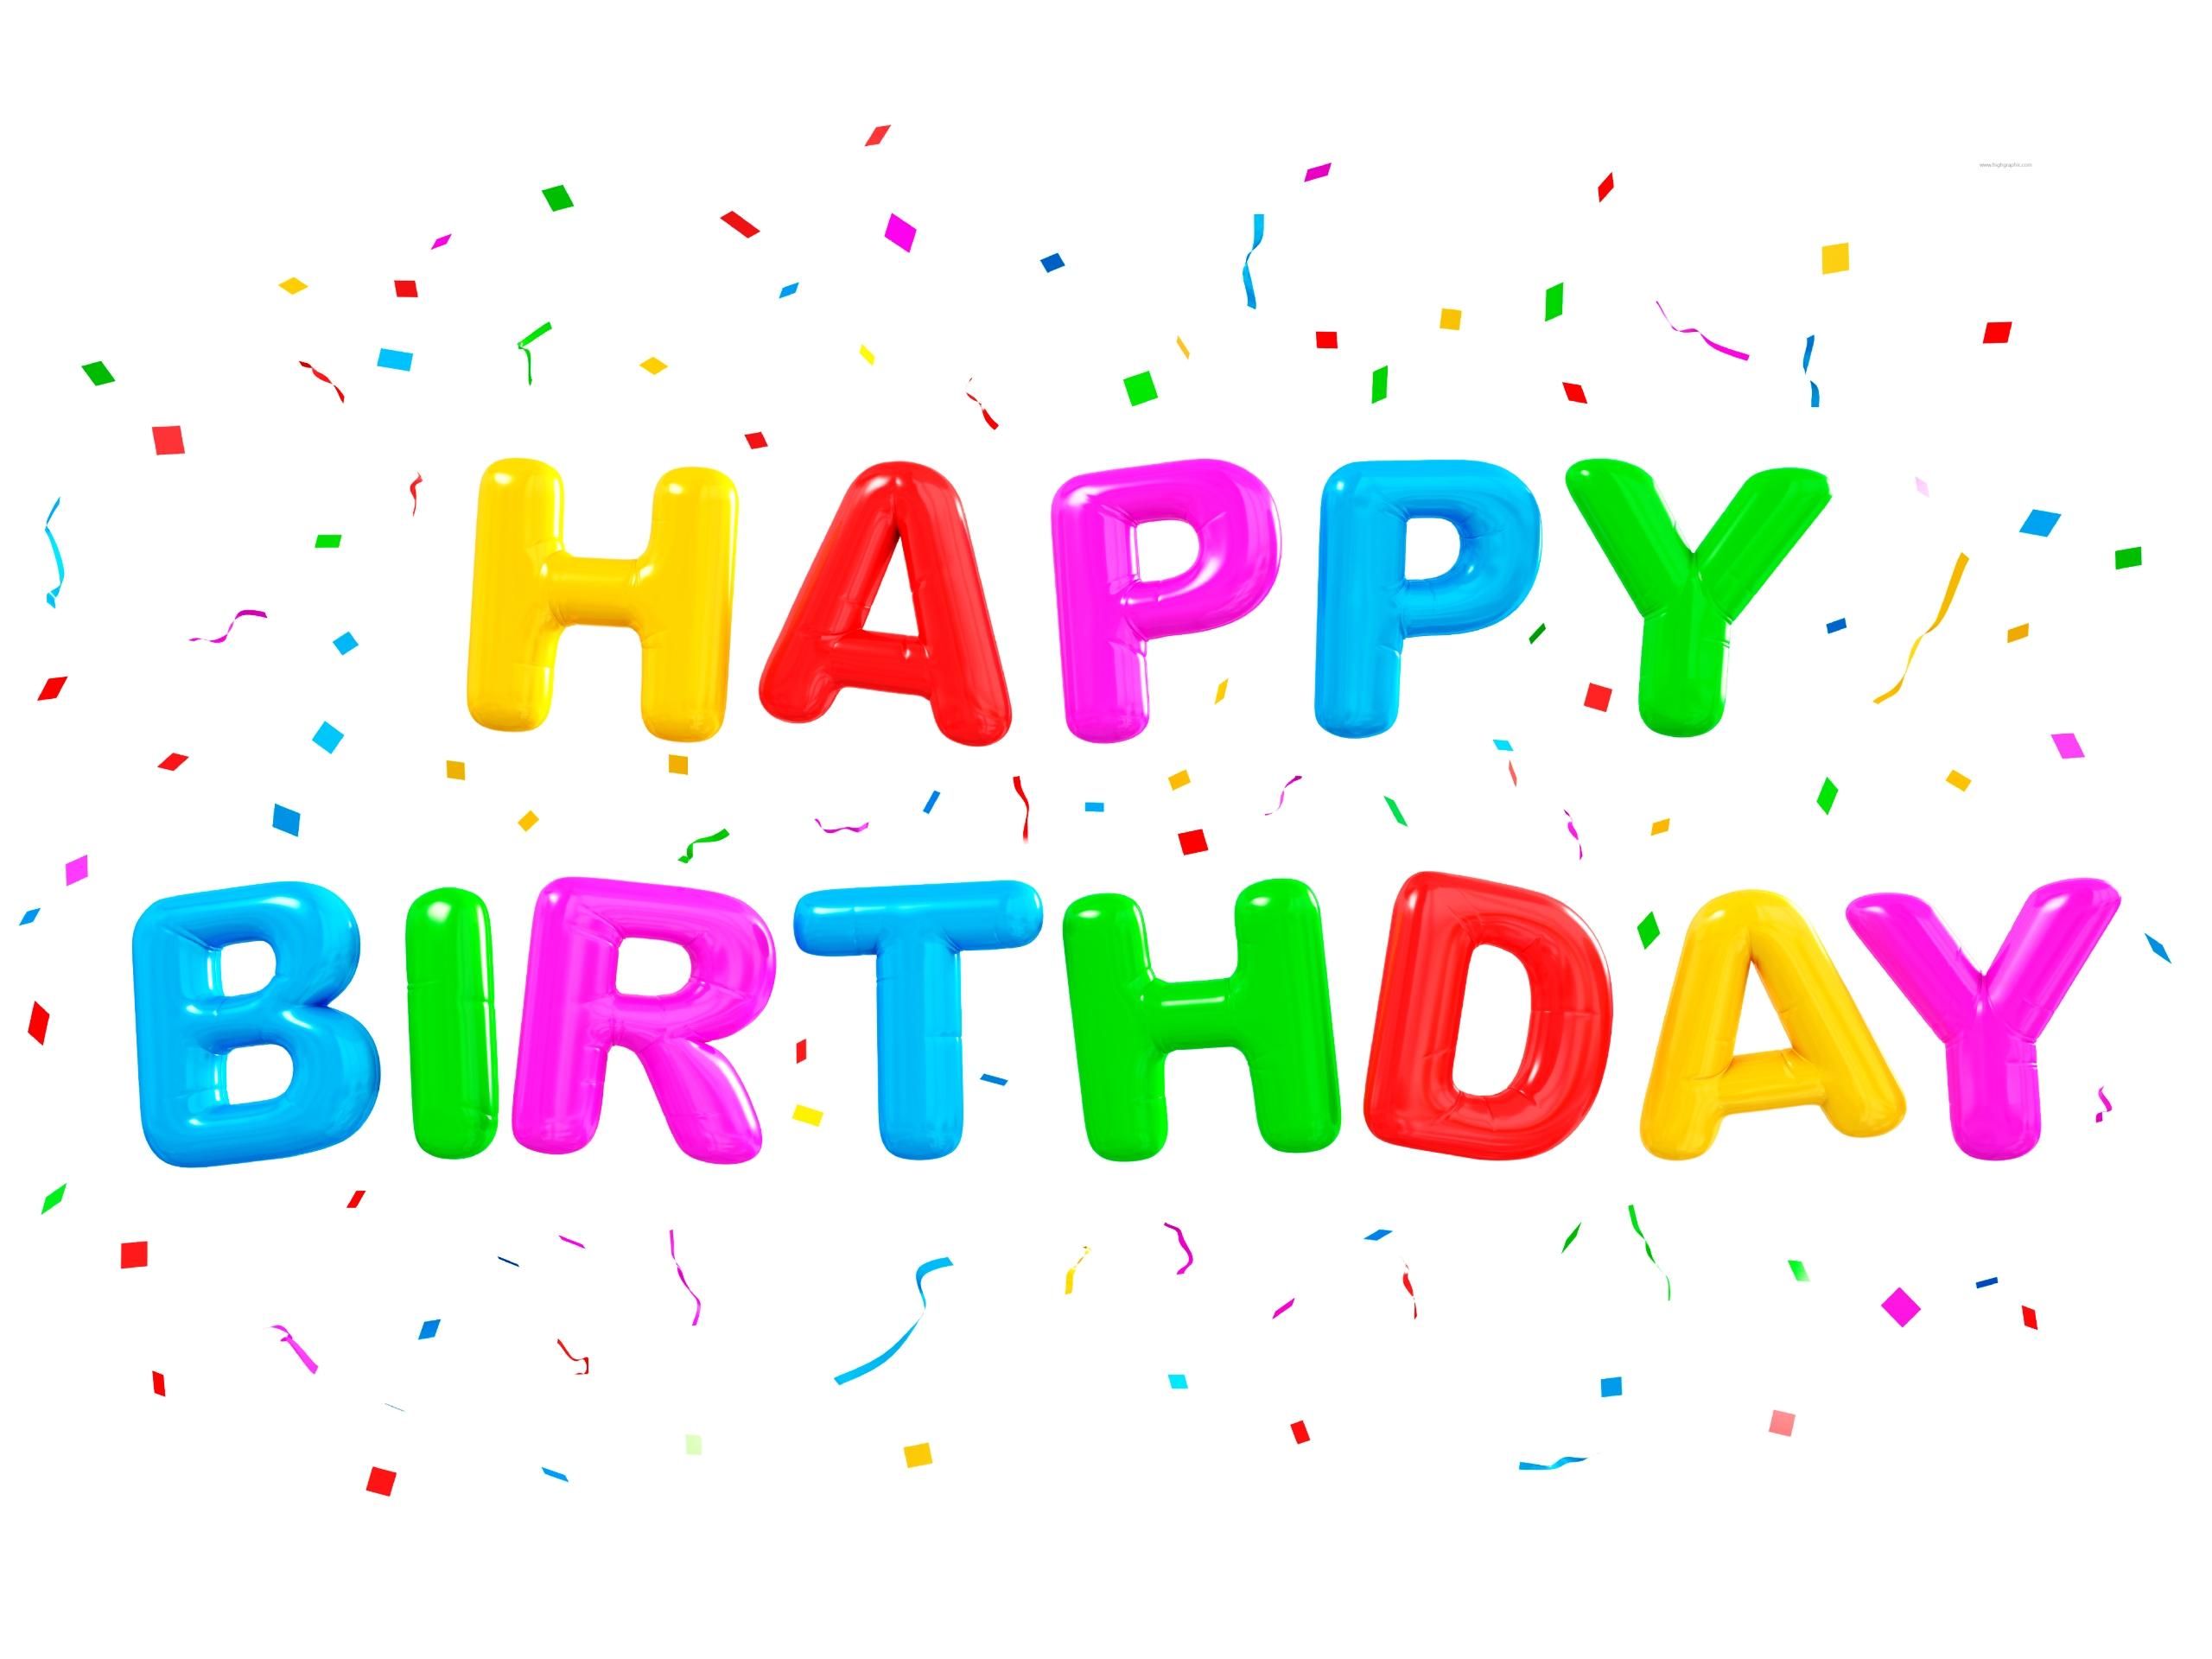 happy birthday images gift - happy birthday images gift - Wallpapers, hd-wallpapers, HD, Free, Birthday, 4k-wallpapers, 4k